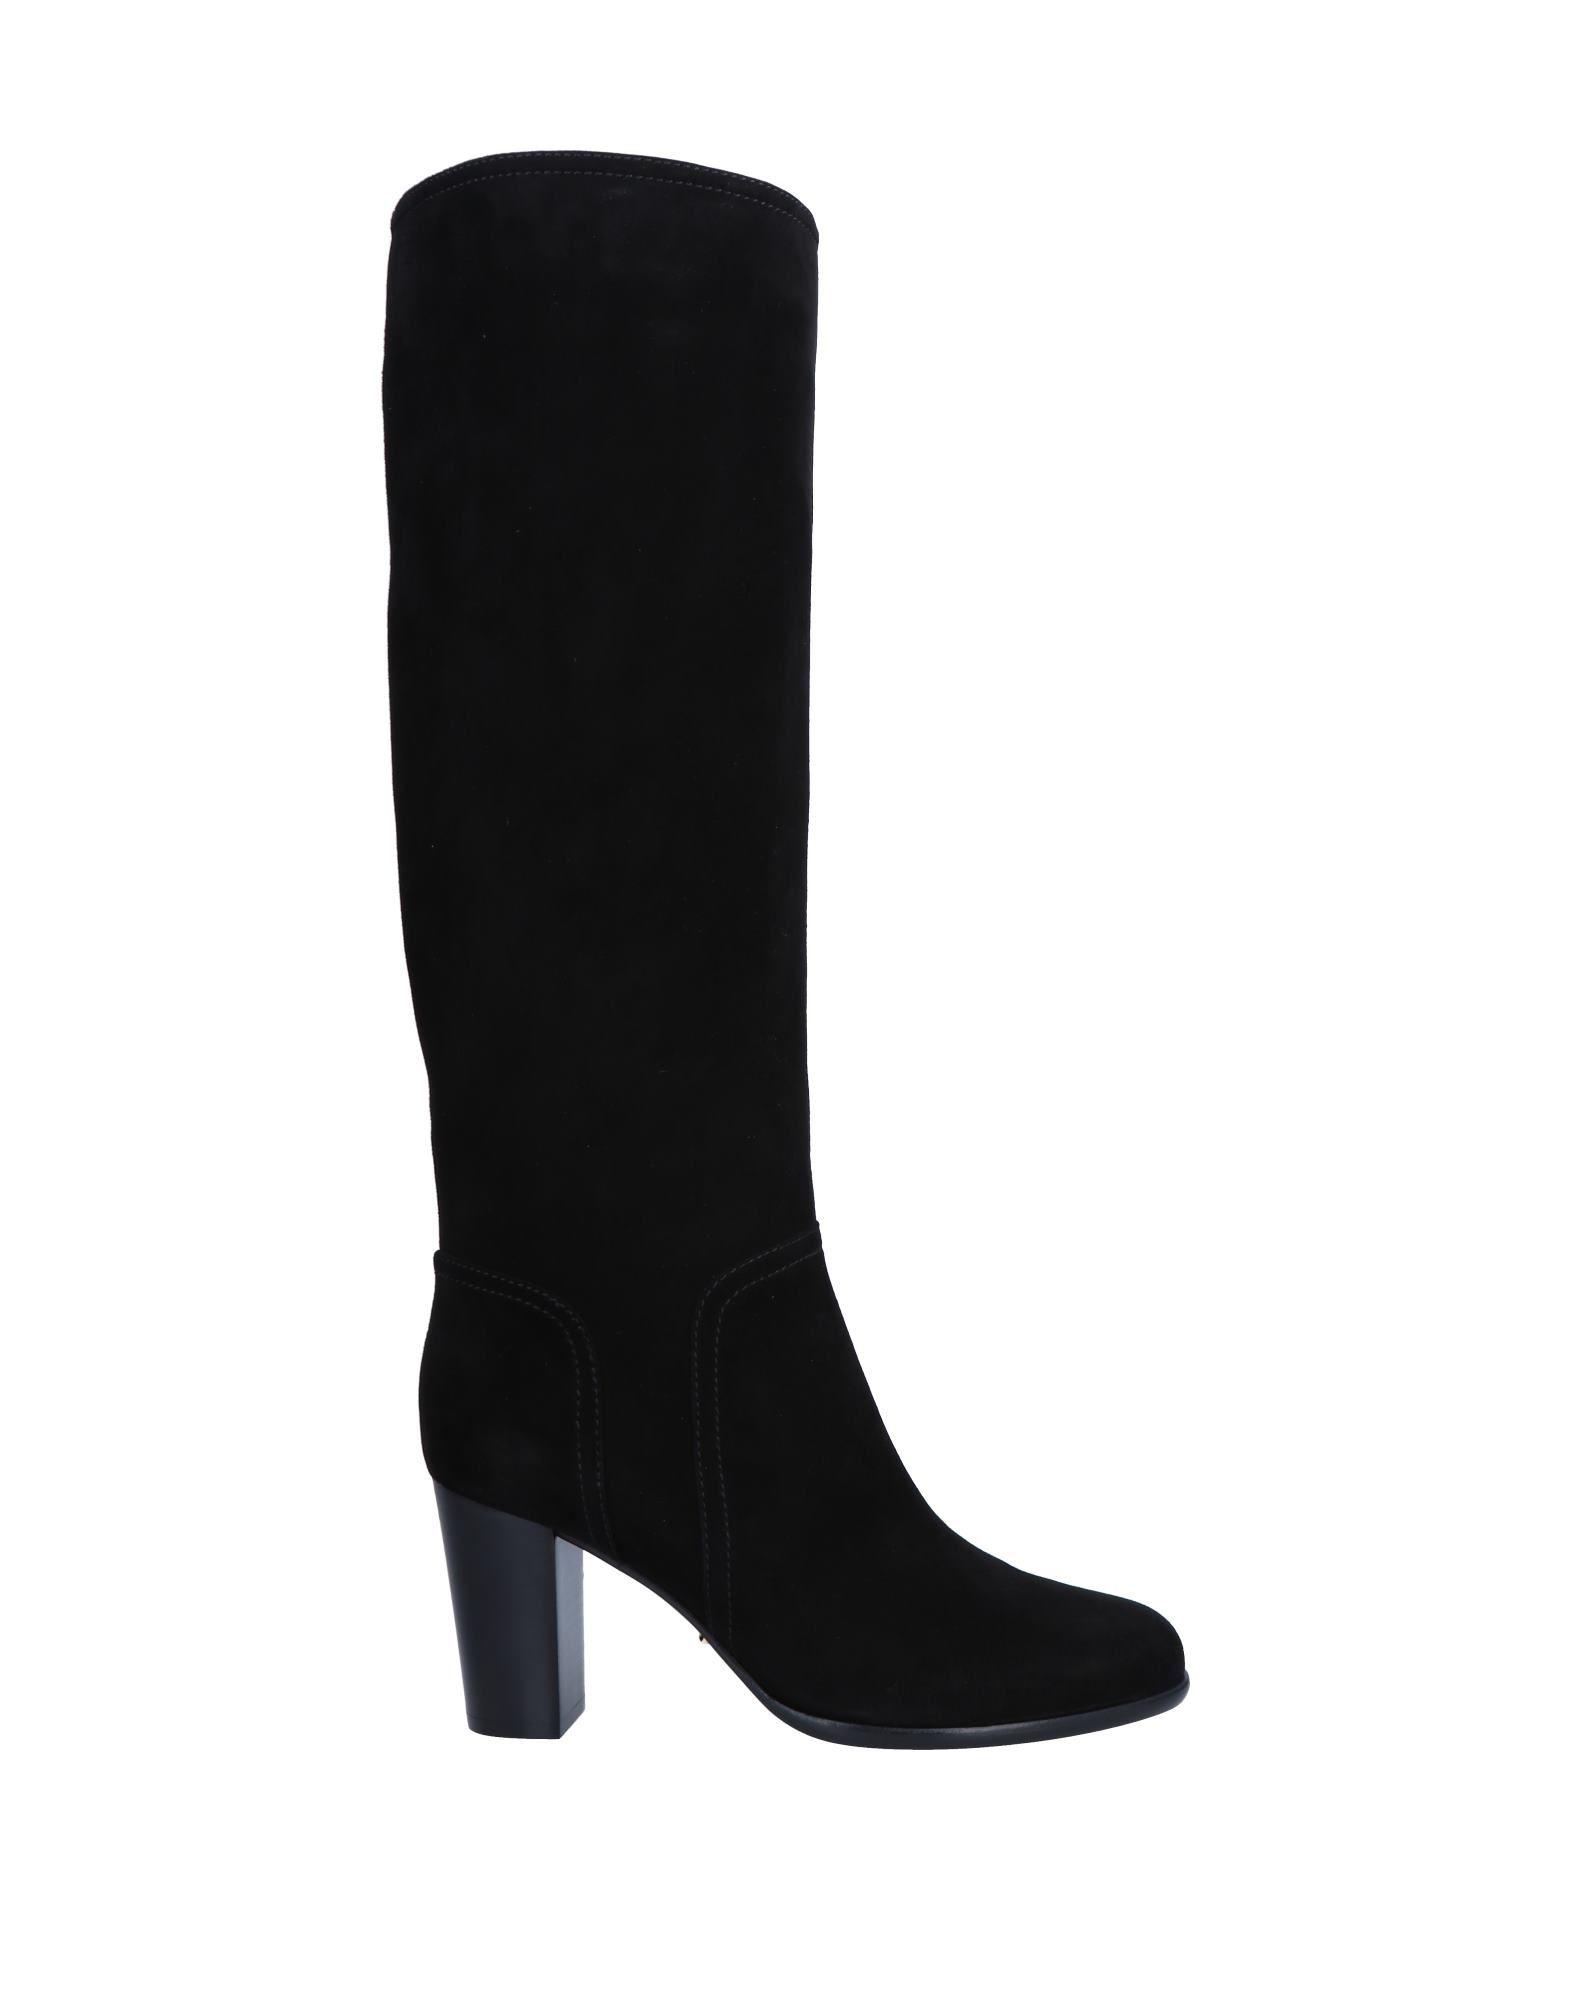 Sergio Rossi Boots - Women on Sergio Rossi Boots online on Women  United Kingdom - 11564482NX f3d571